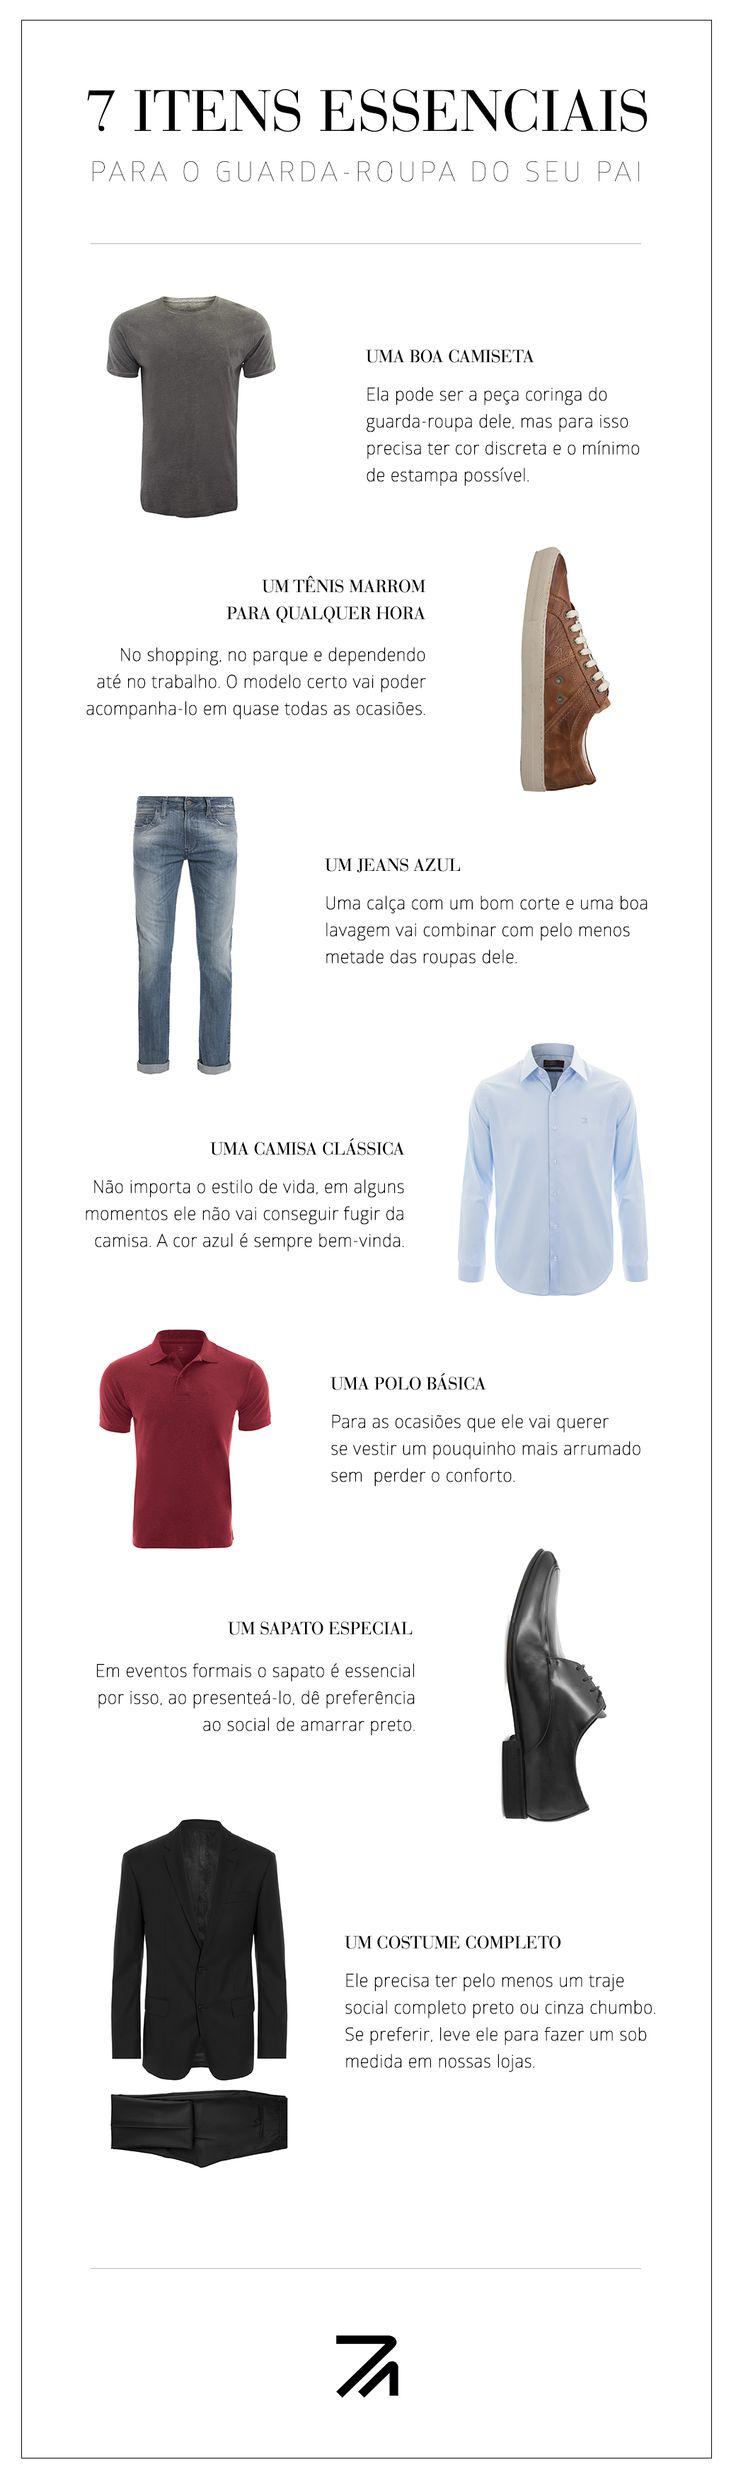 Essenciais do guarda-roupa masculino por Ricardo Almeida - www.ricardoalmeida.com.br Diy Moda, Capsule Wardrobe, Editorial Fashion, Mens Fashion, Man Style, Boys, Inspiration, Outfits, Shopping